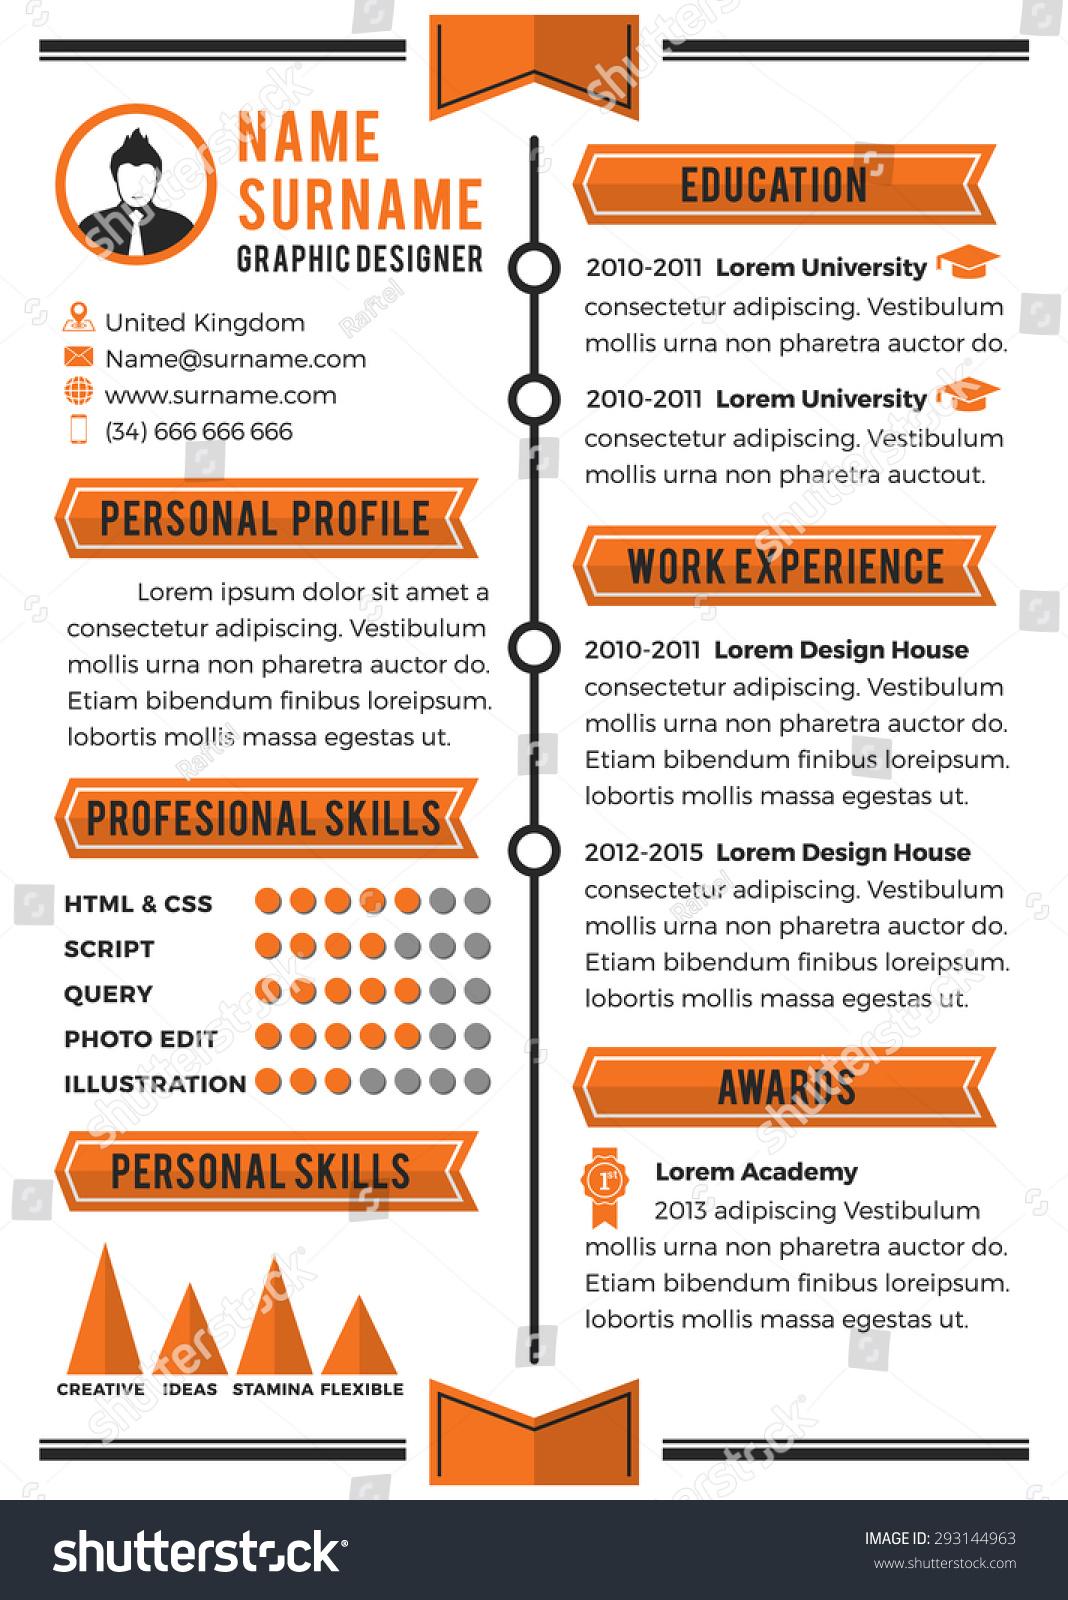 Personal Curriculum Vitae Template Simplicity Professional Stock